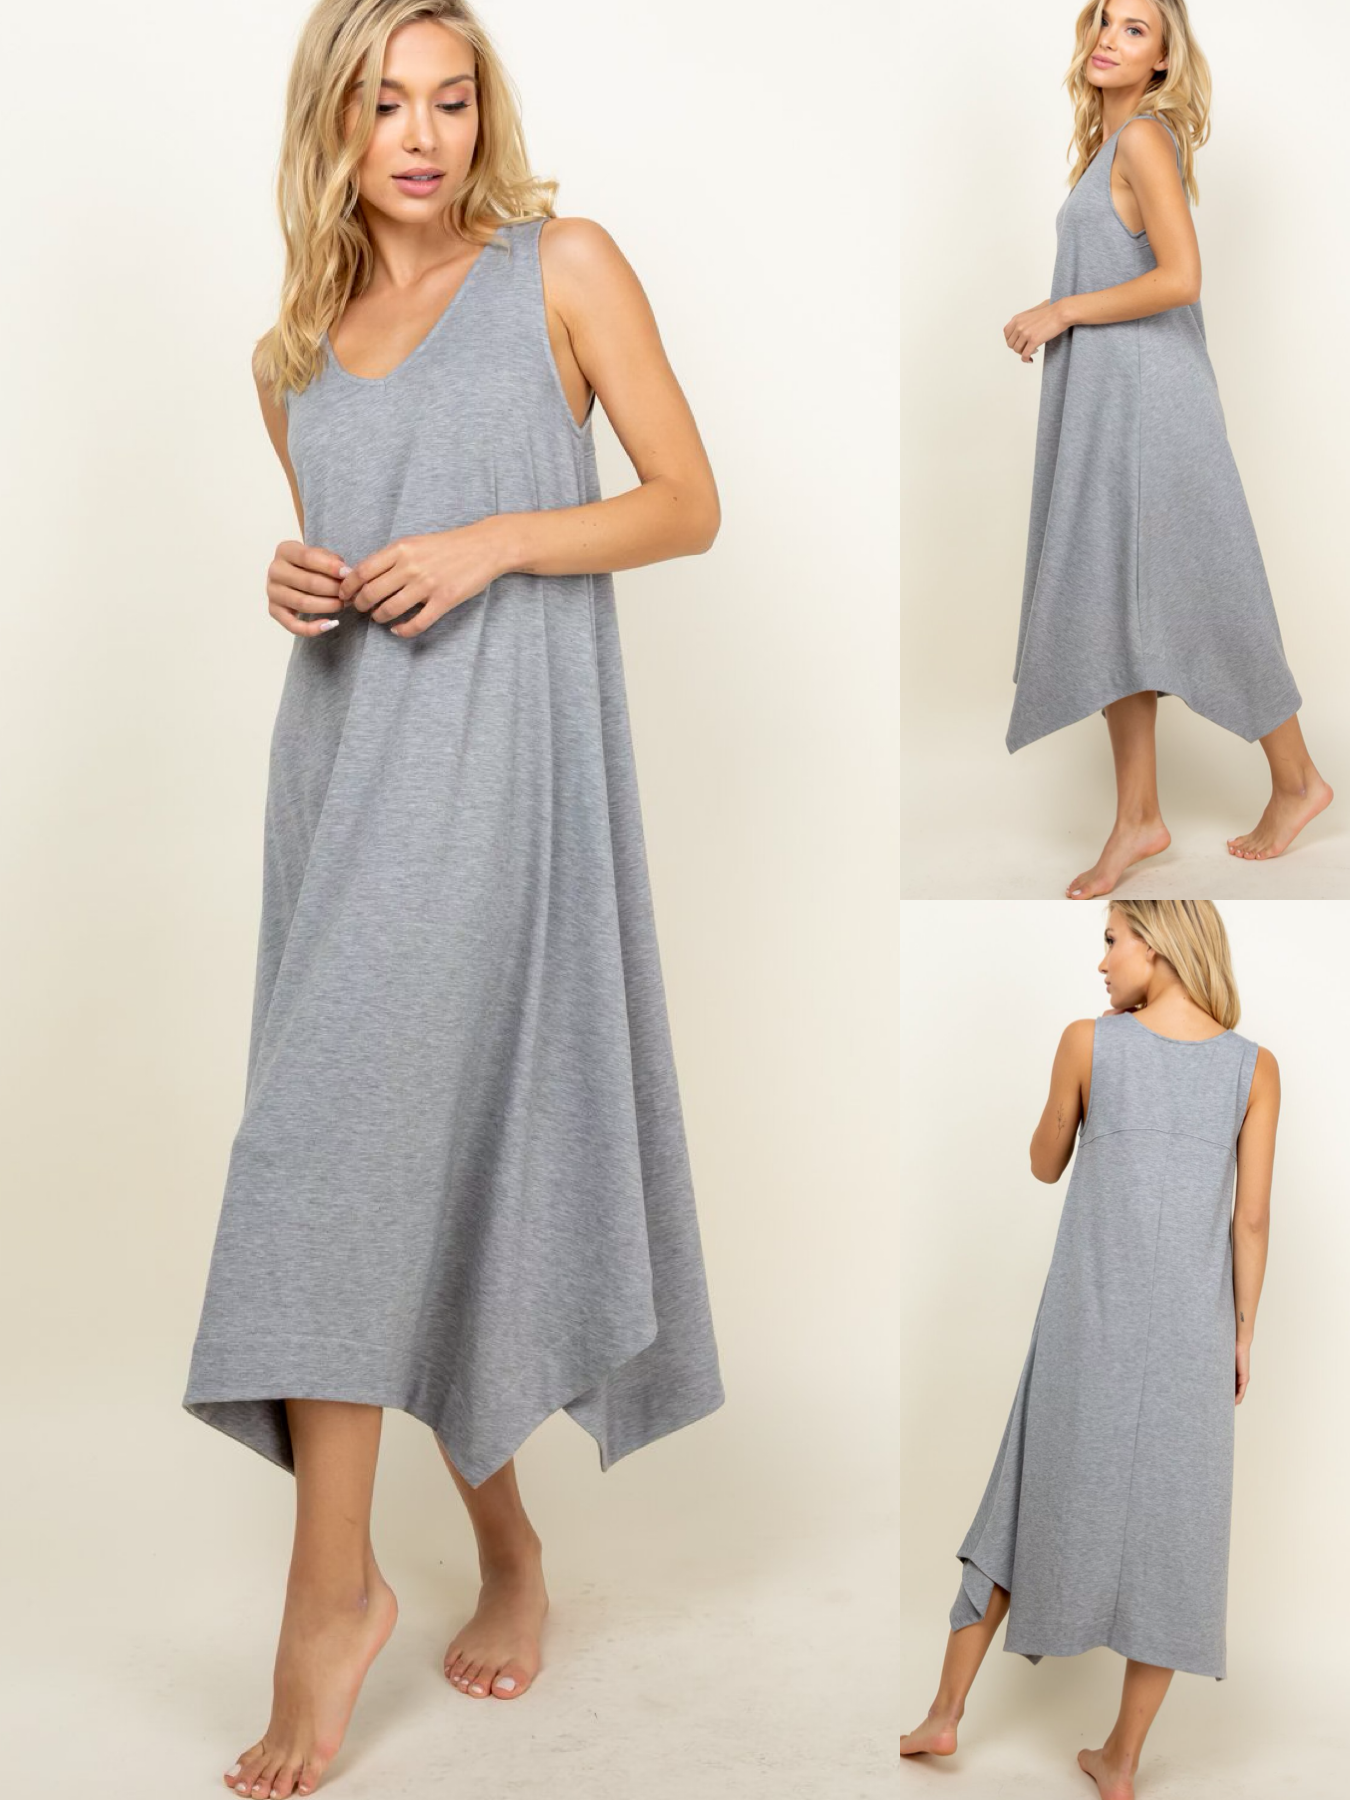 French Terry Asymmetrical Dress